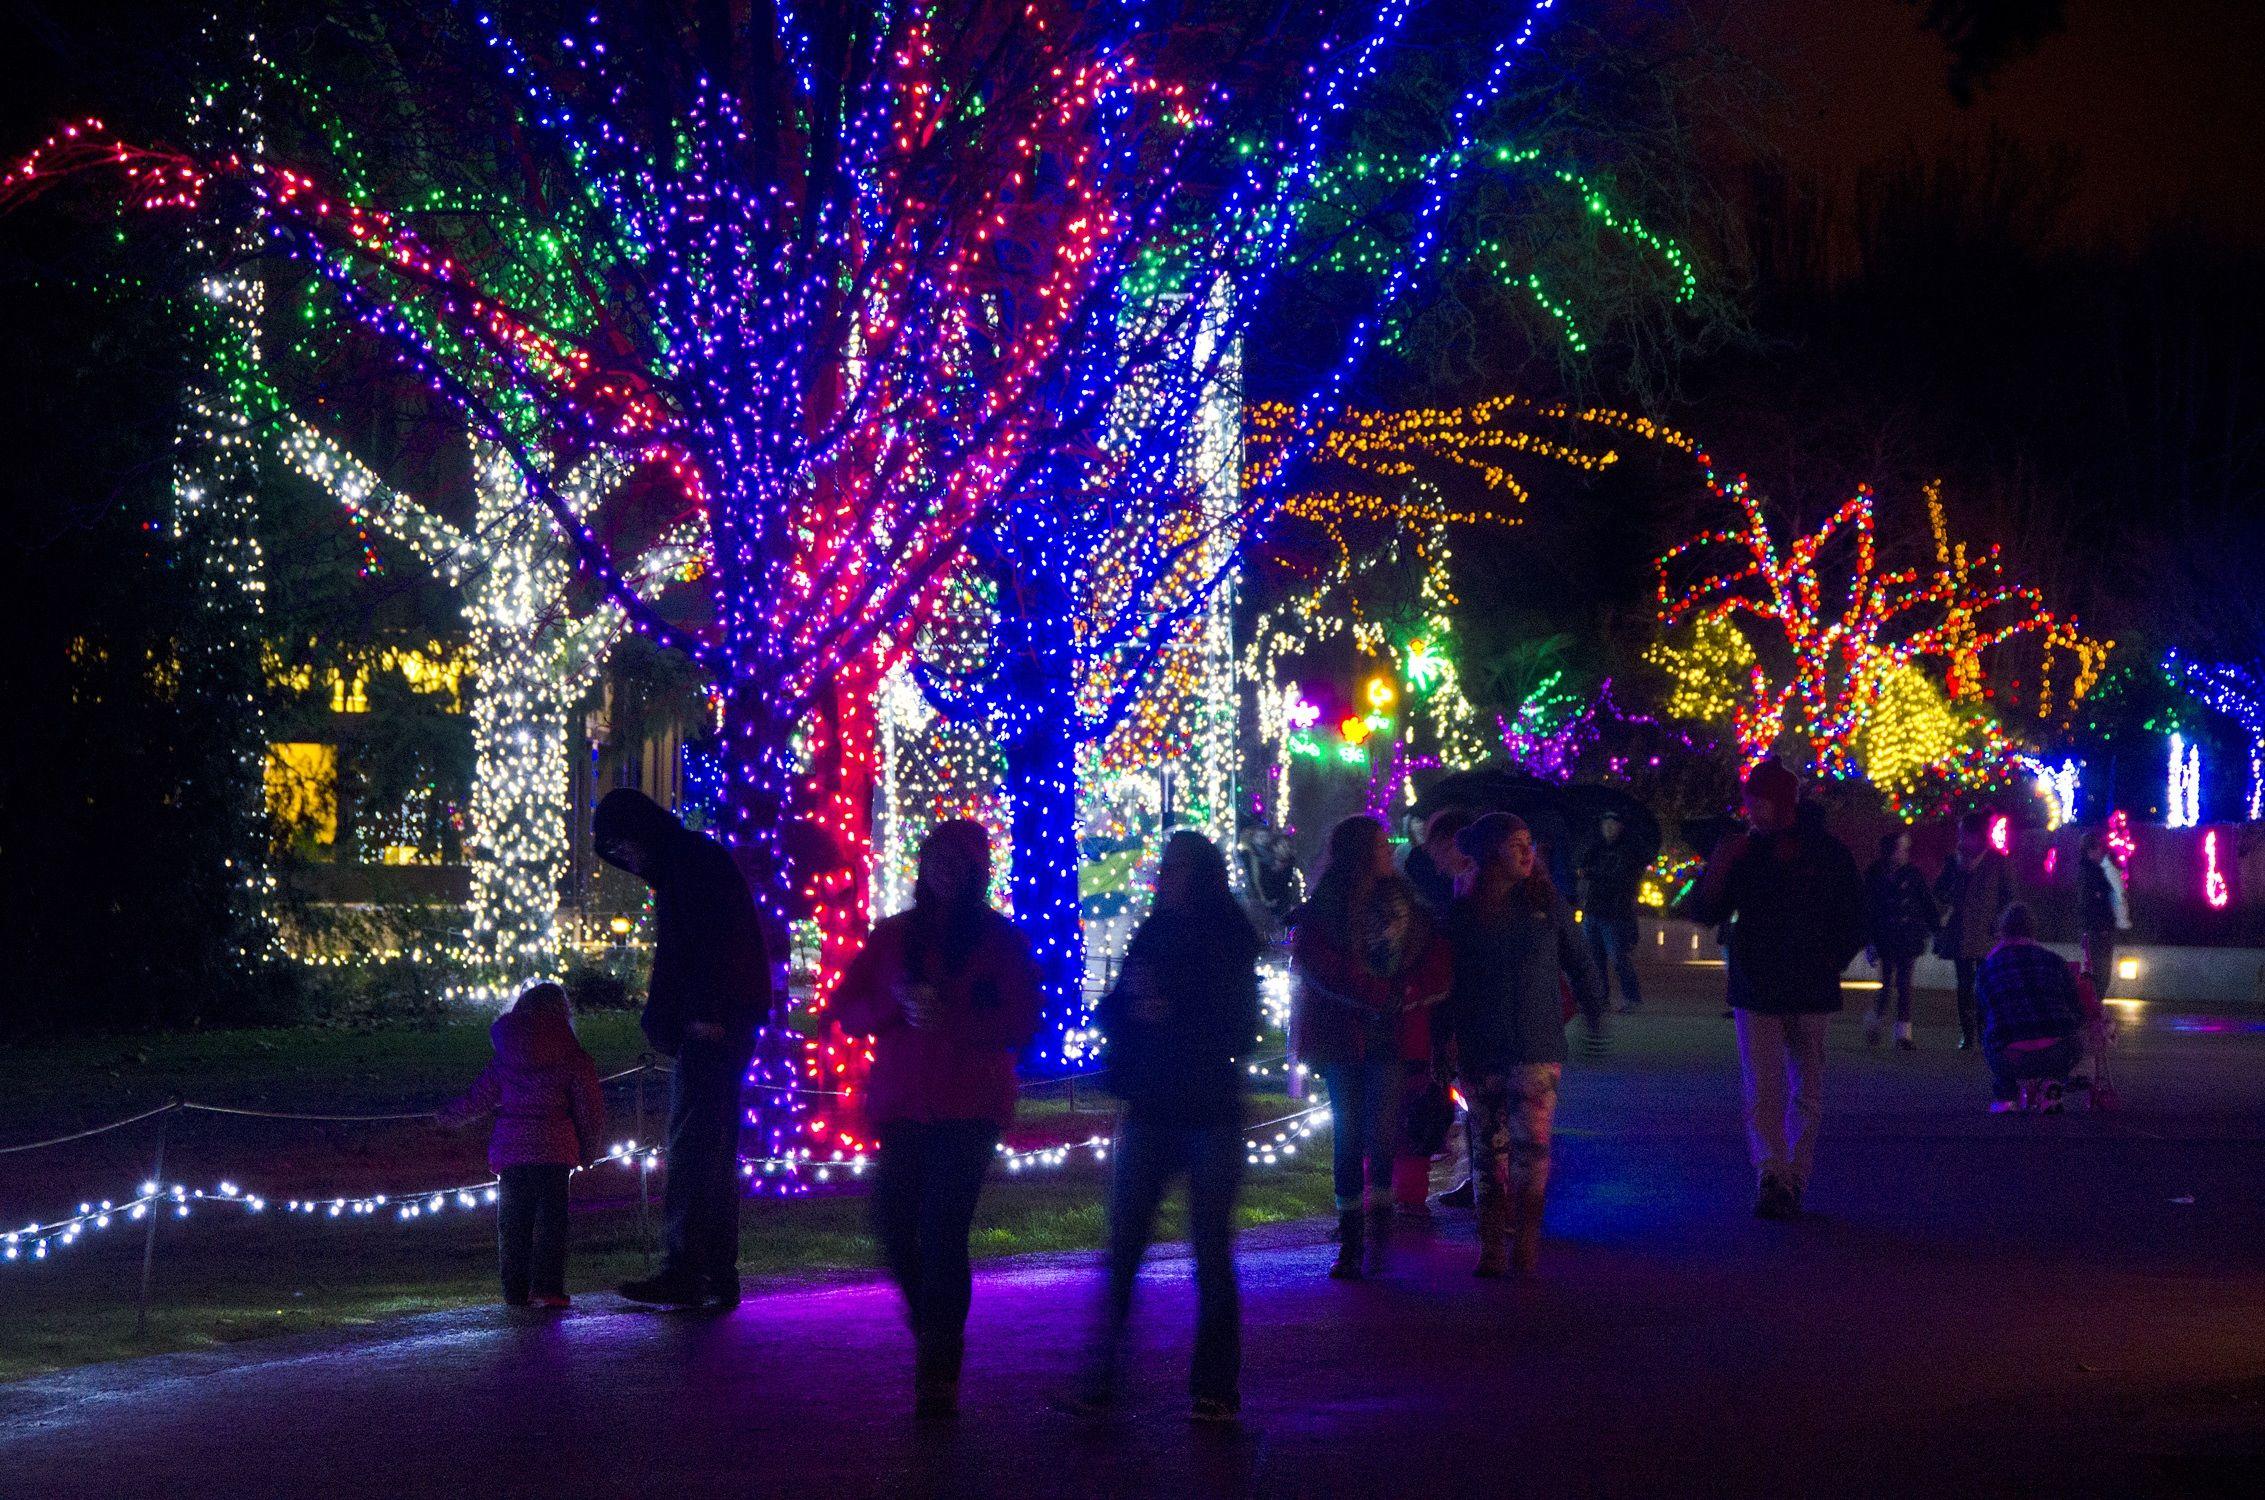 Best Christmas And Holiday Light Displays Around Seattle Tacoma Inside Christmas Light Displays Holiday Lights Display Holiday Lights Christmas Light Displays